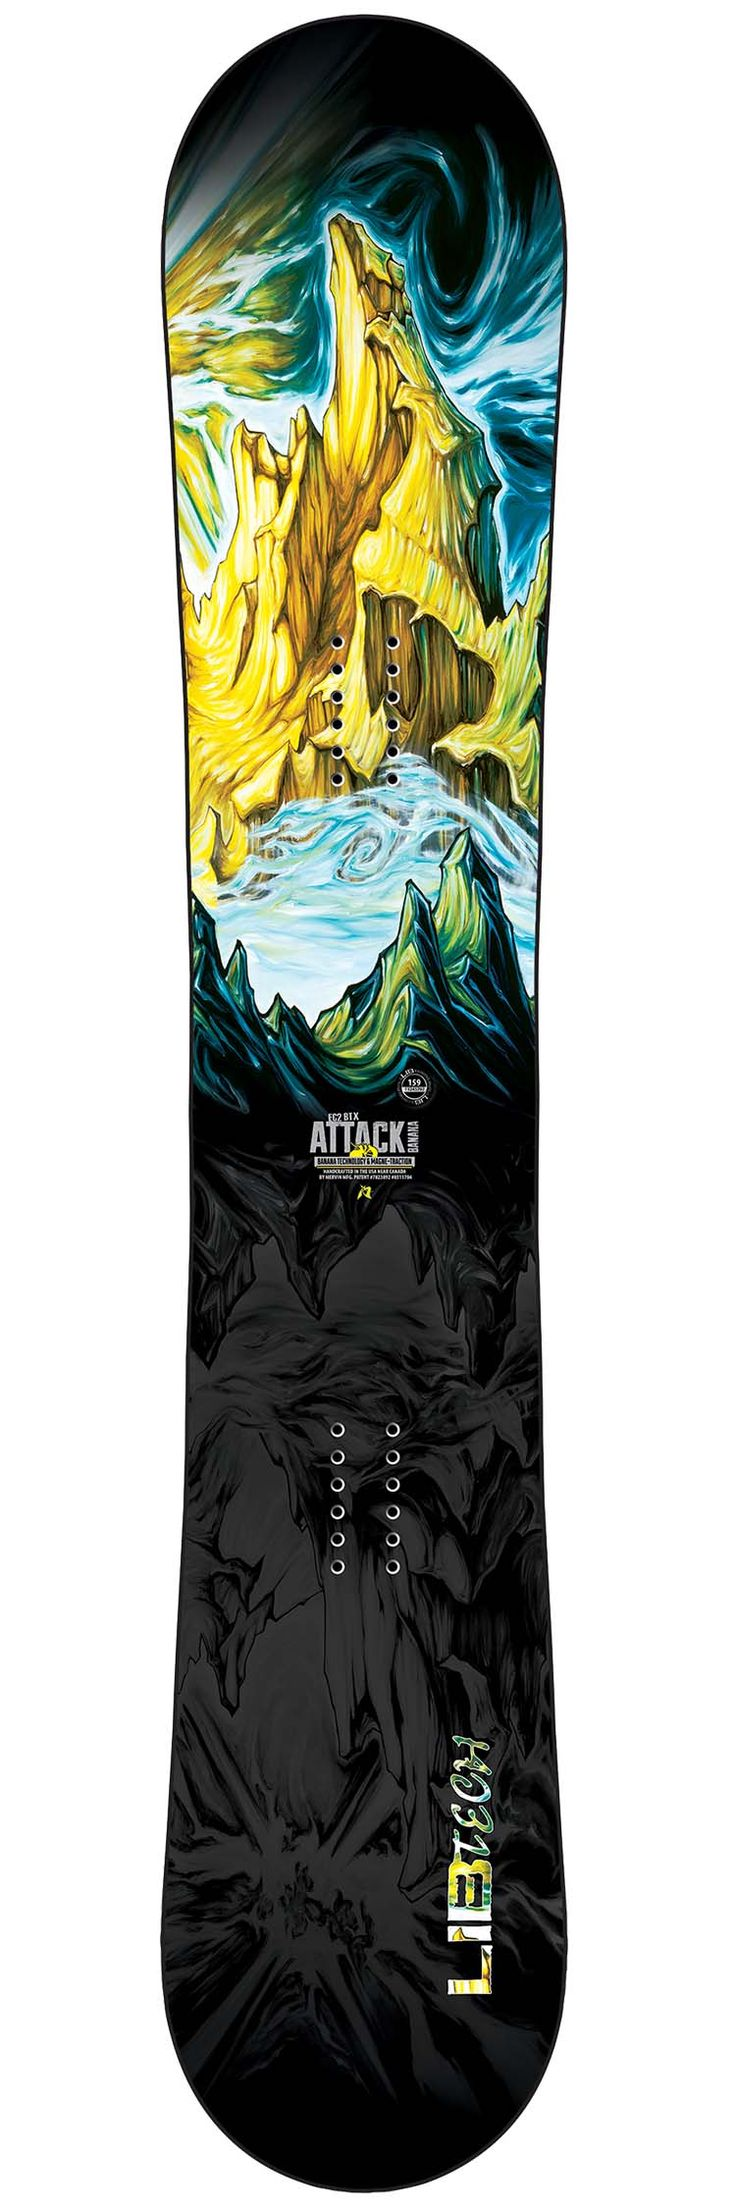 Lib tech attack banana avec images planche snowboard